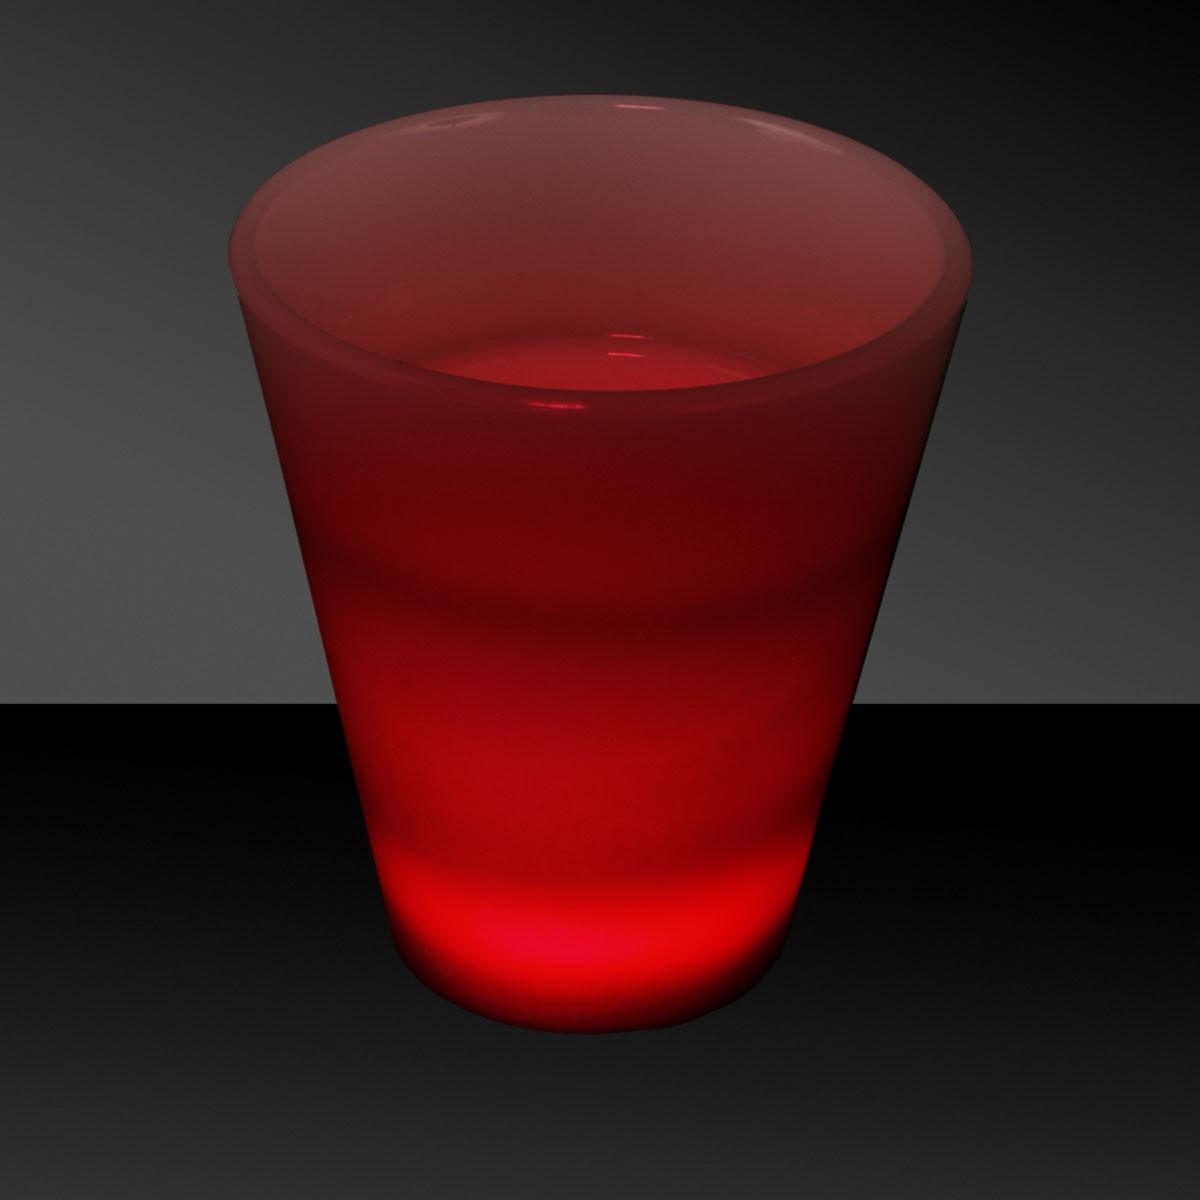 RED 2 OZ.NEON LOOK SHOT GLASS